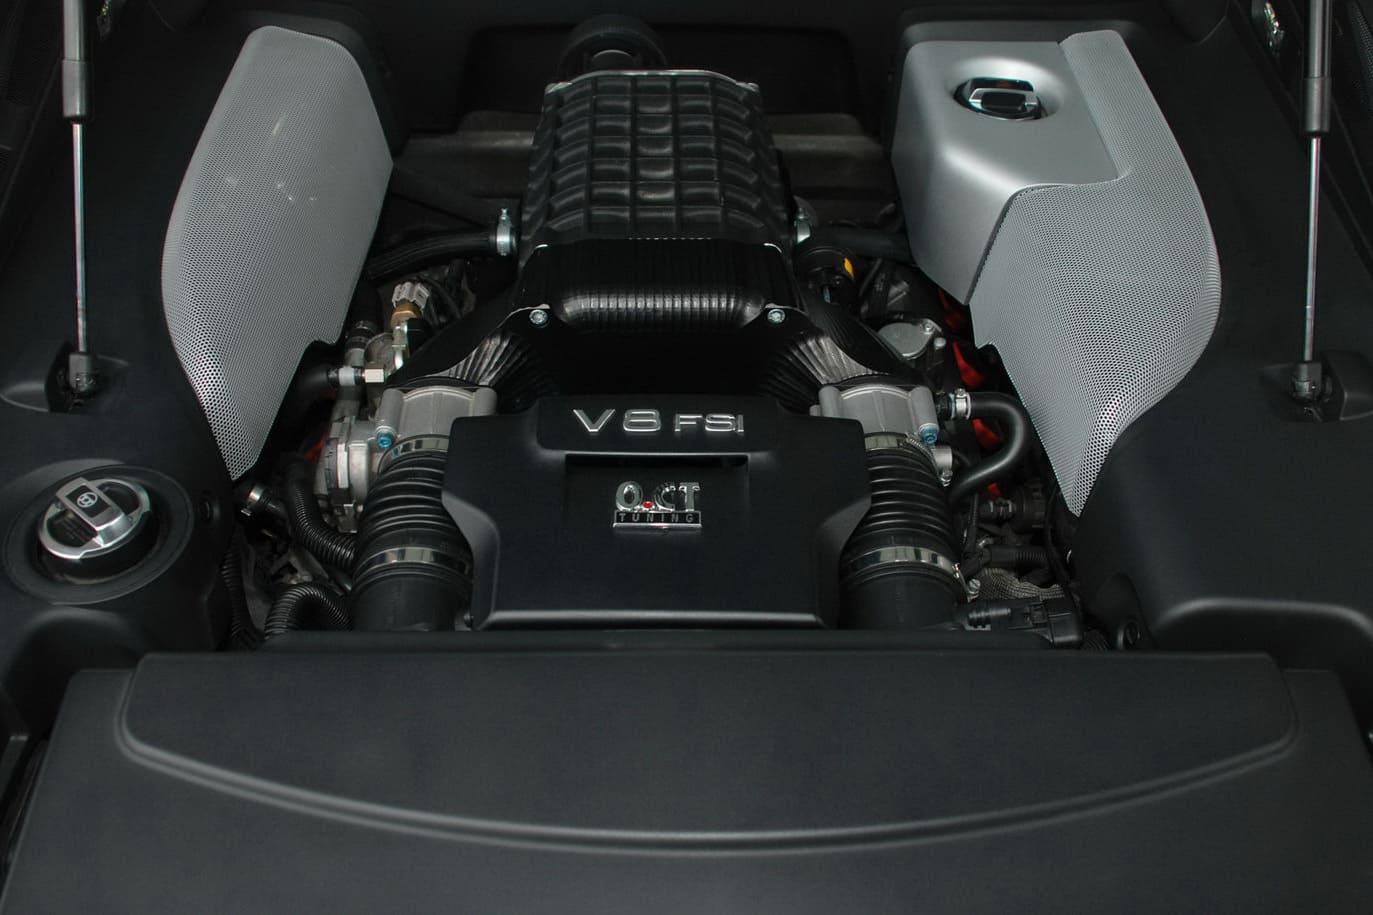 OCT Tuning Audi R8 V8 9